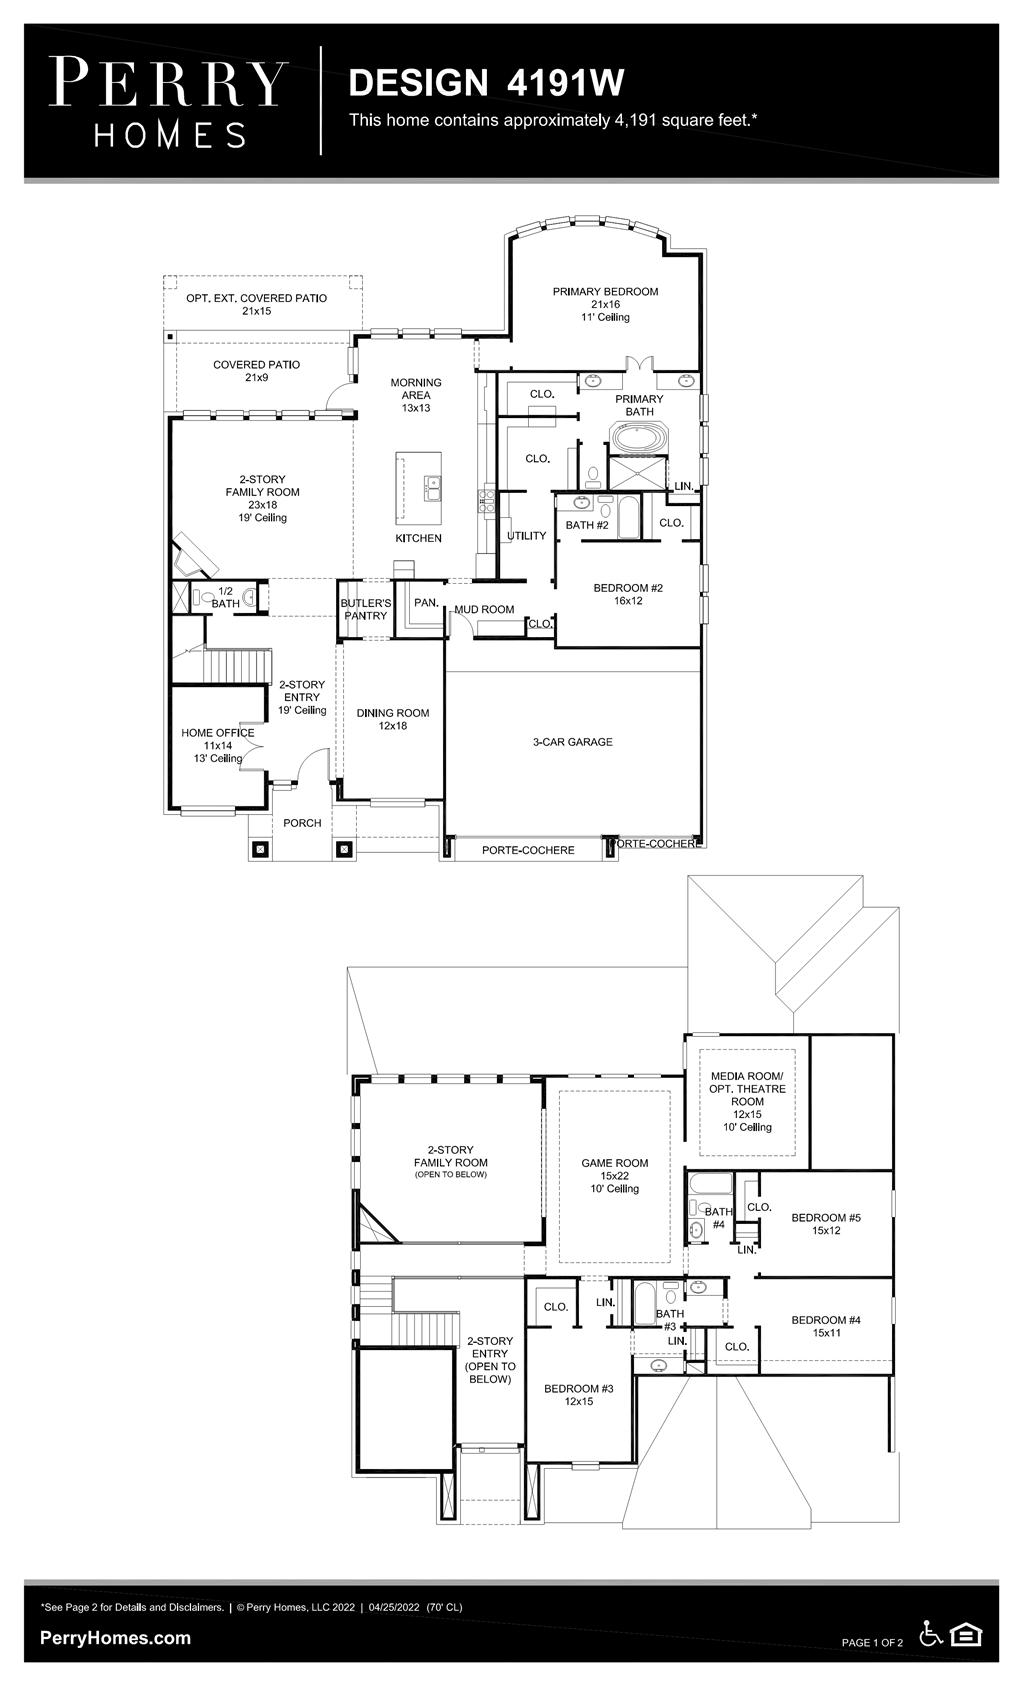 Floor Plan for 4191W